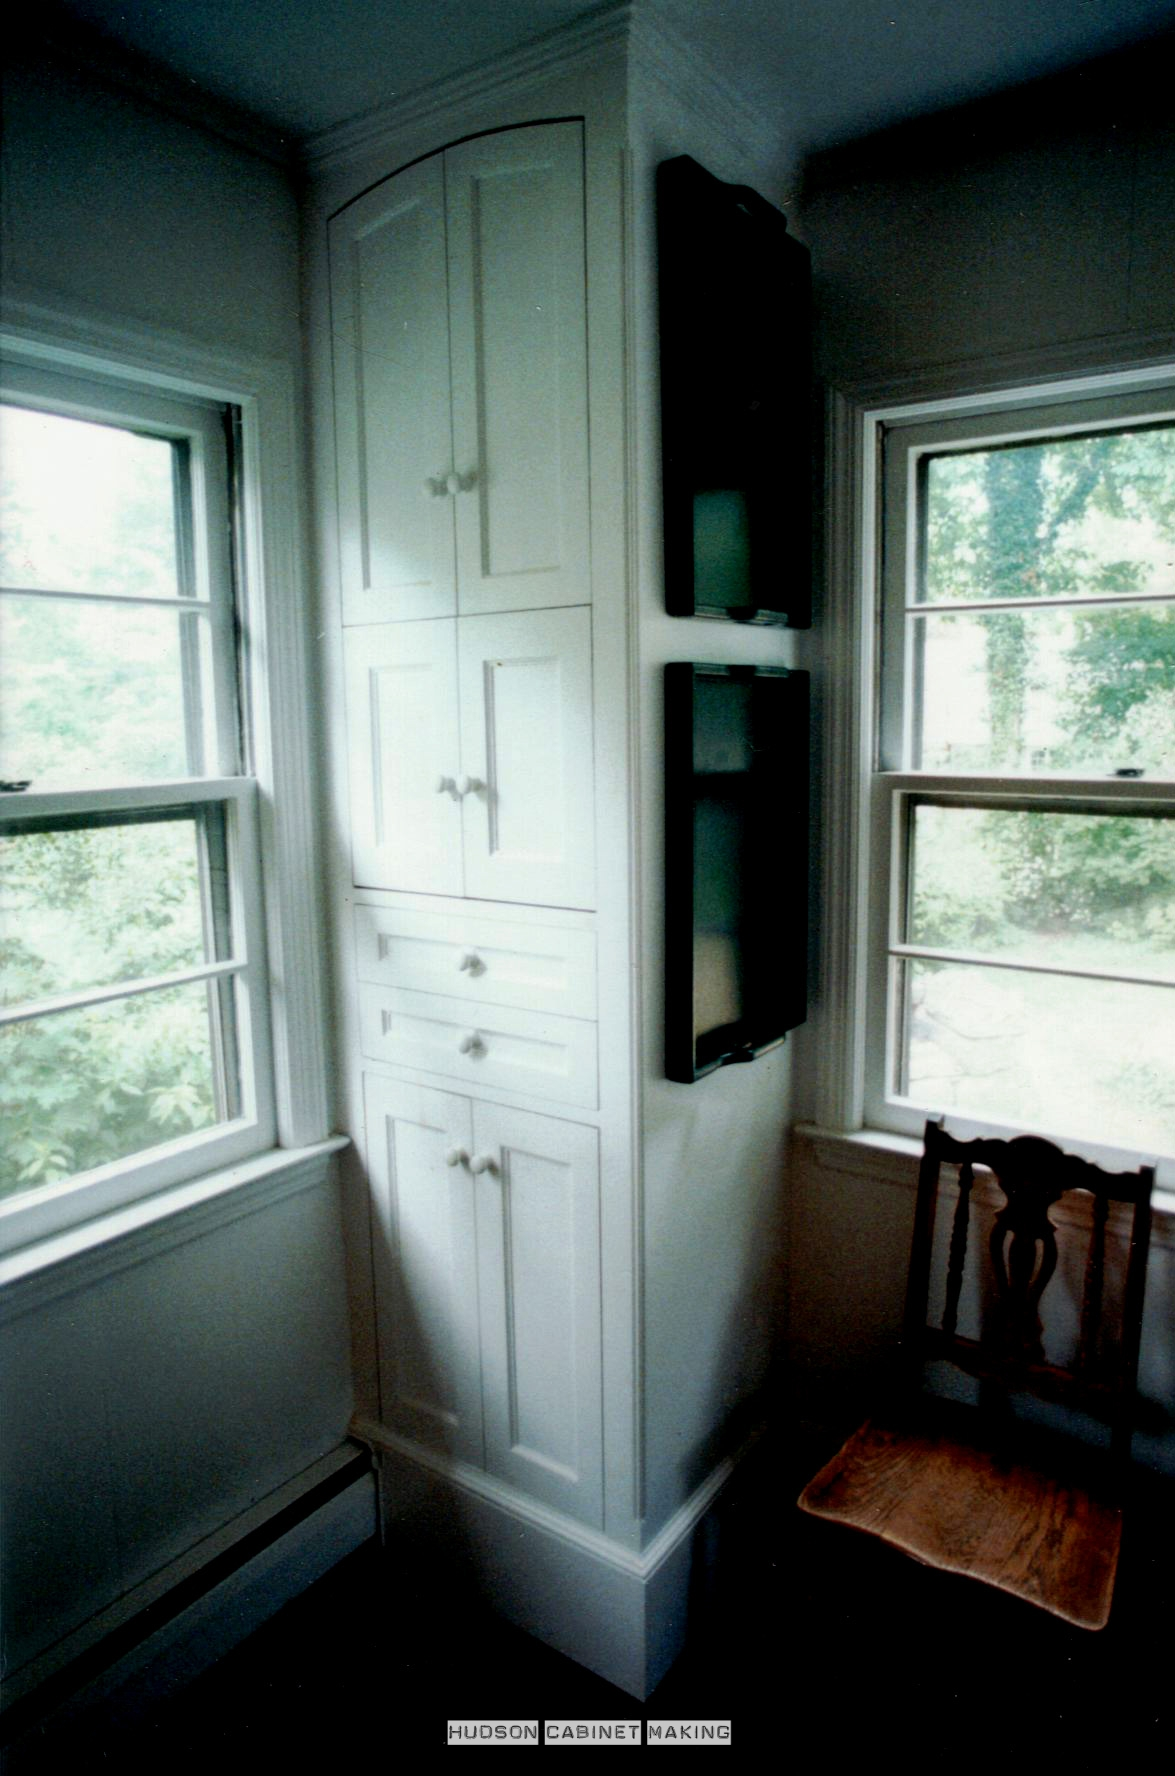 the kitchen - Hudson Cabinet Making .:. 845.225.2967